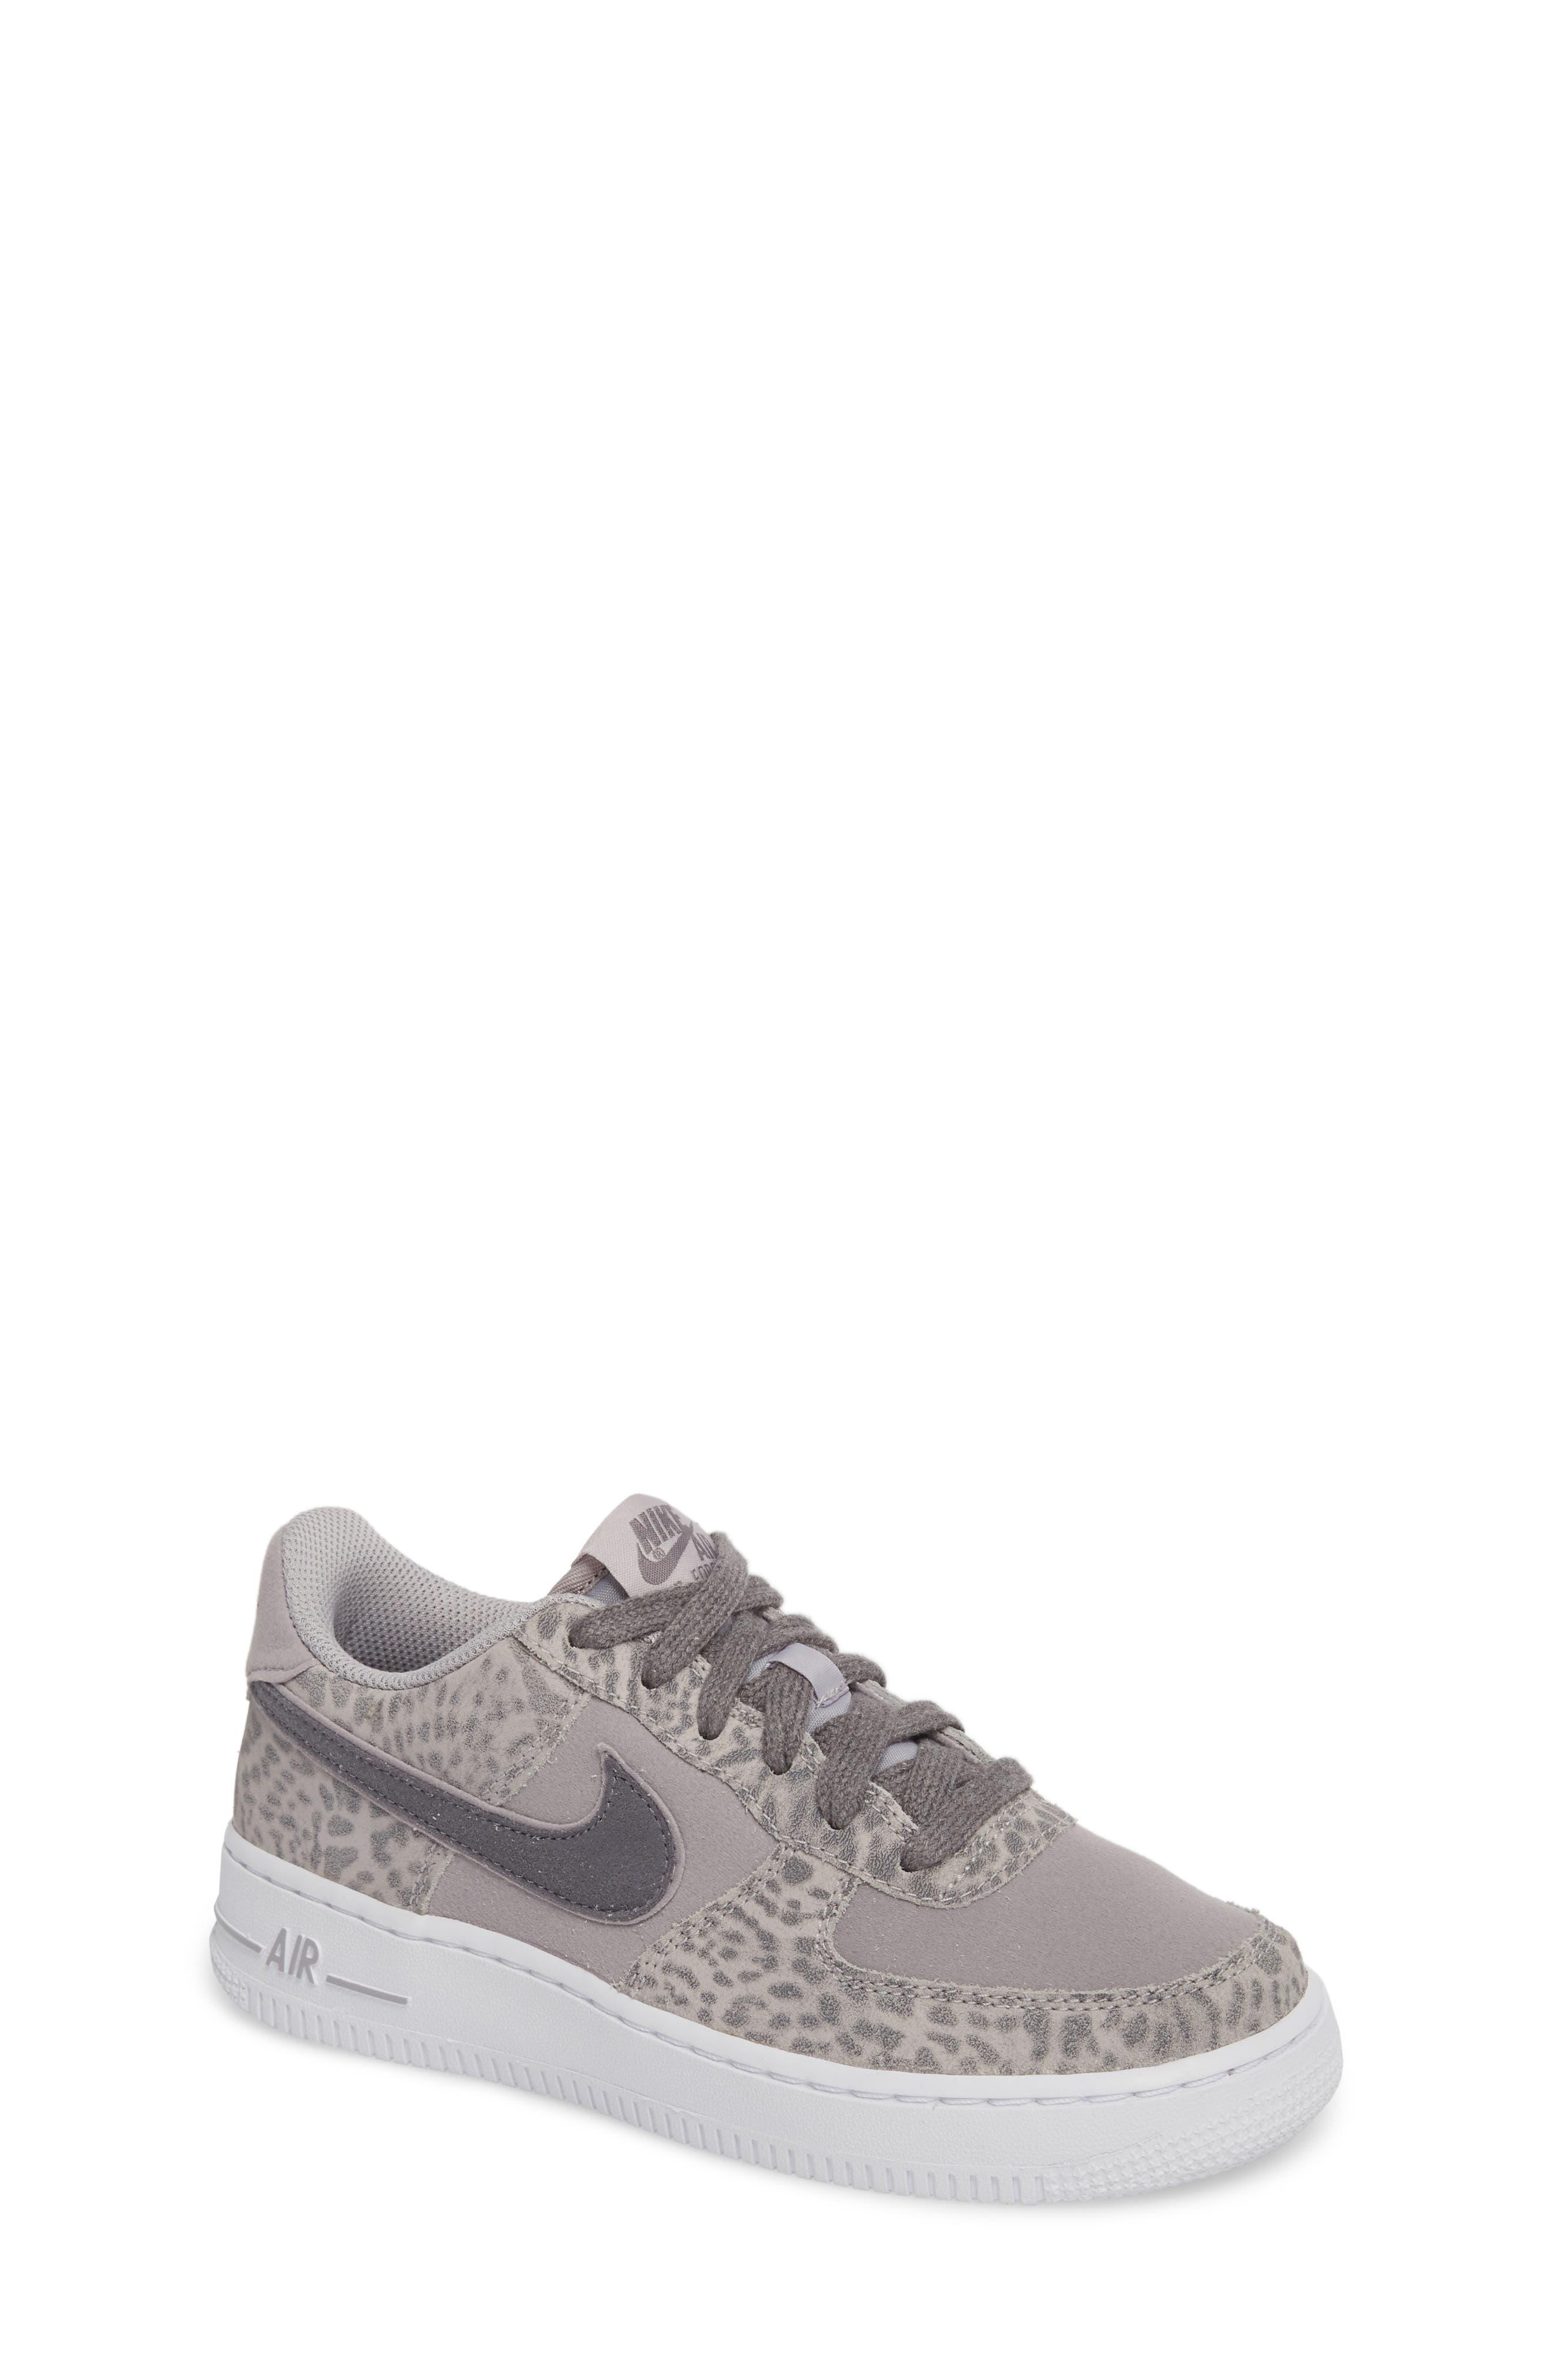 Air Force 1 LV8 Sneaker,                             Main thumbnail 1, color,                             020